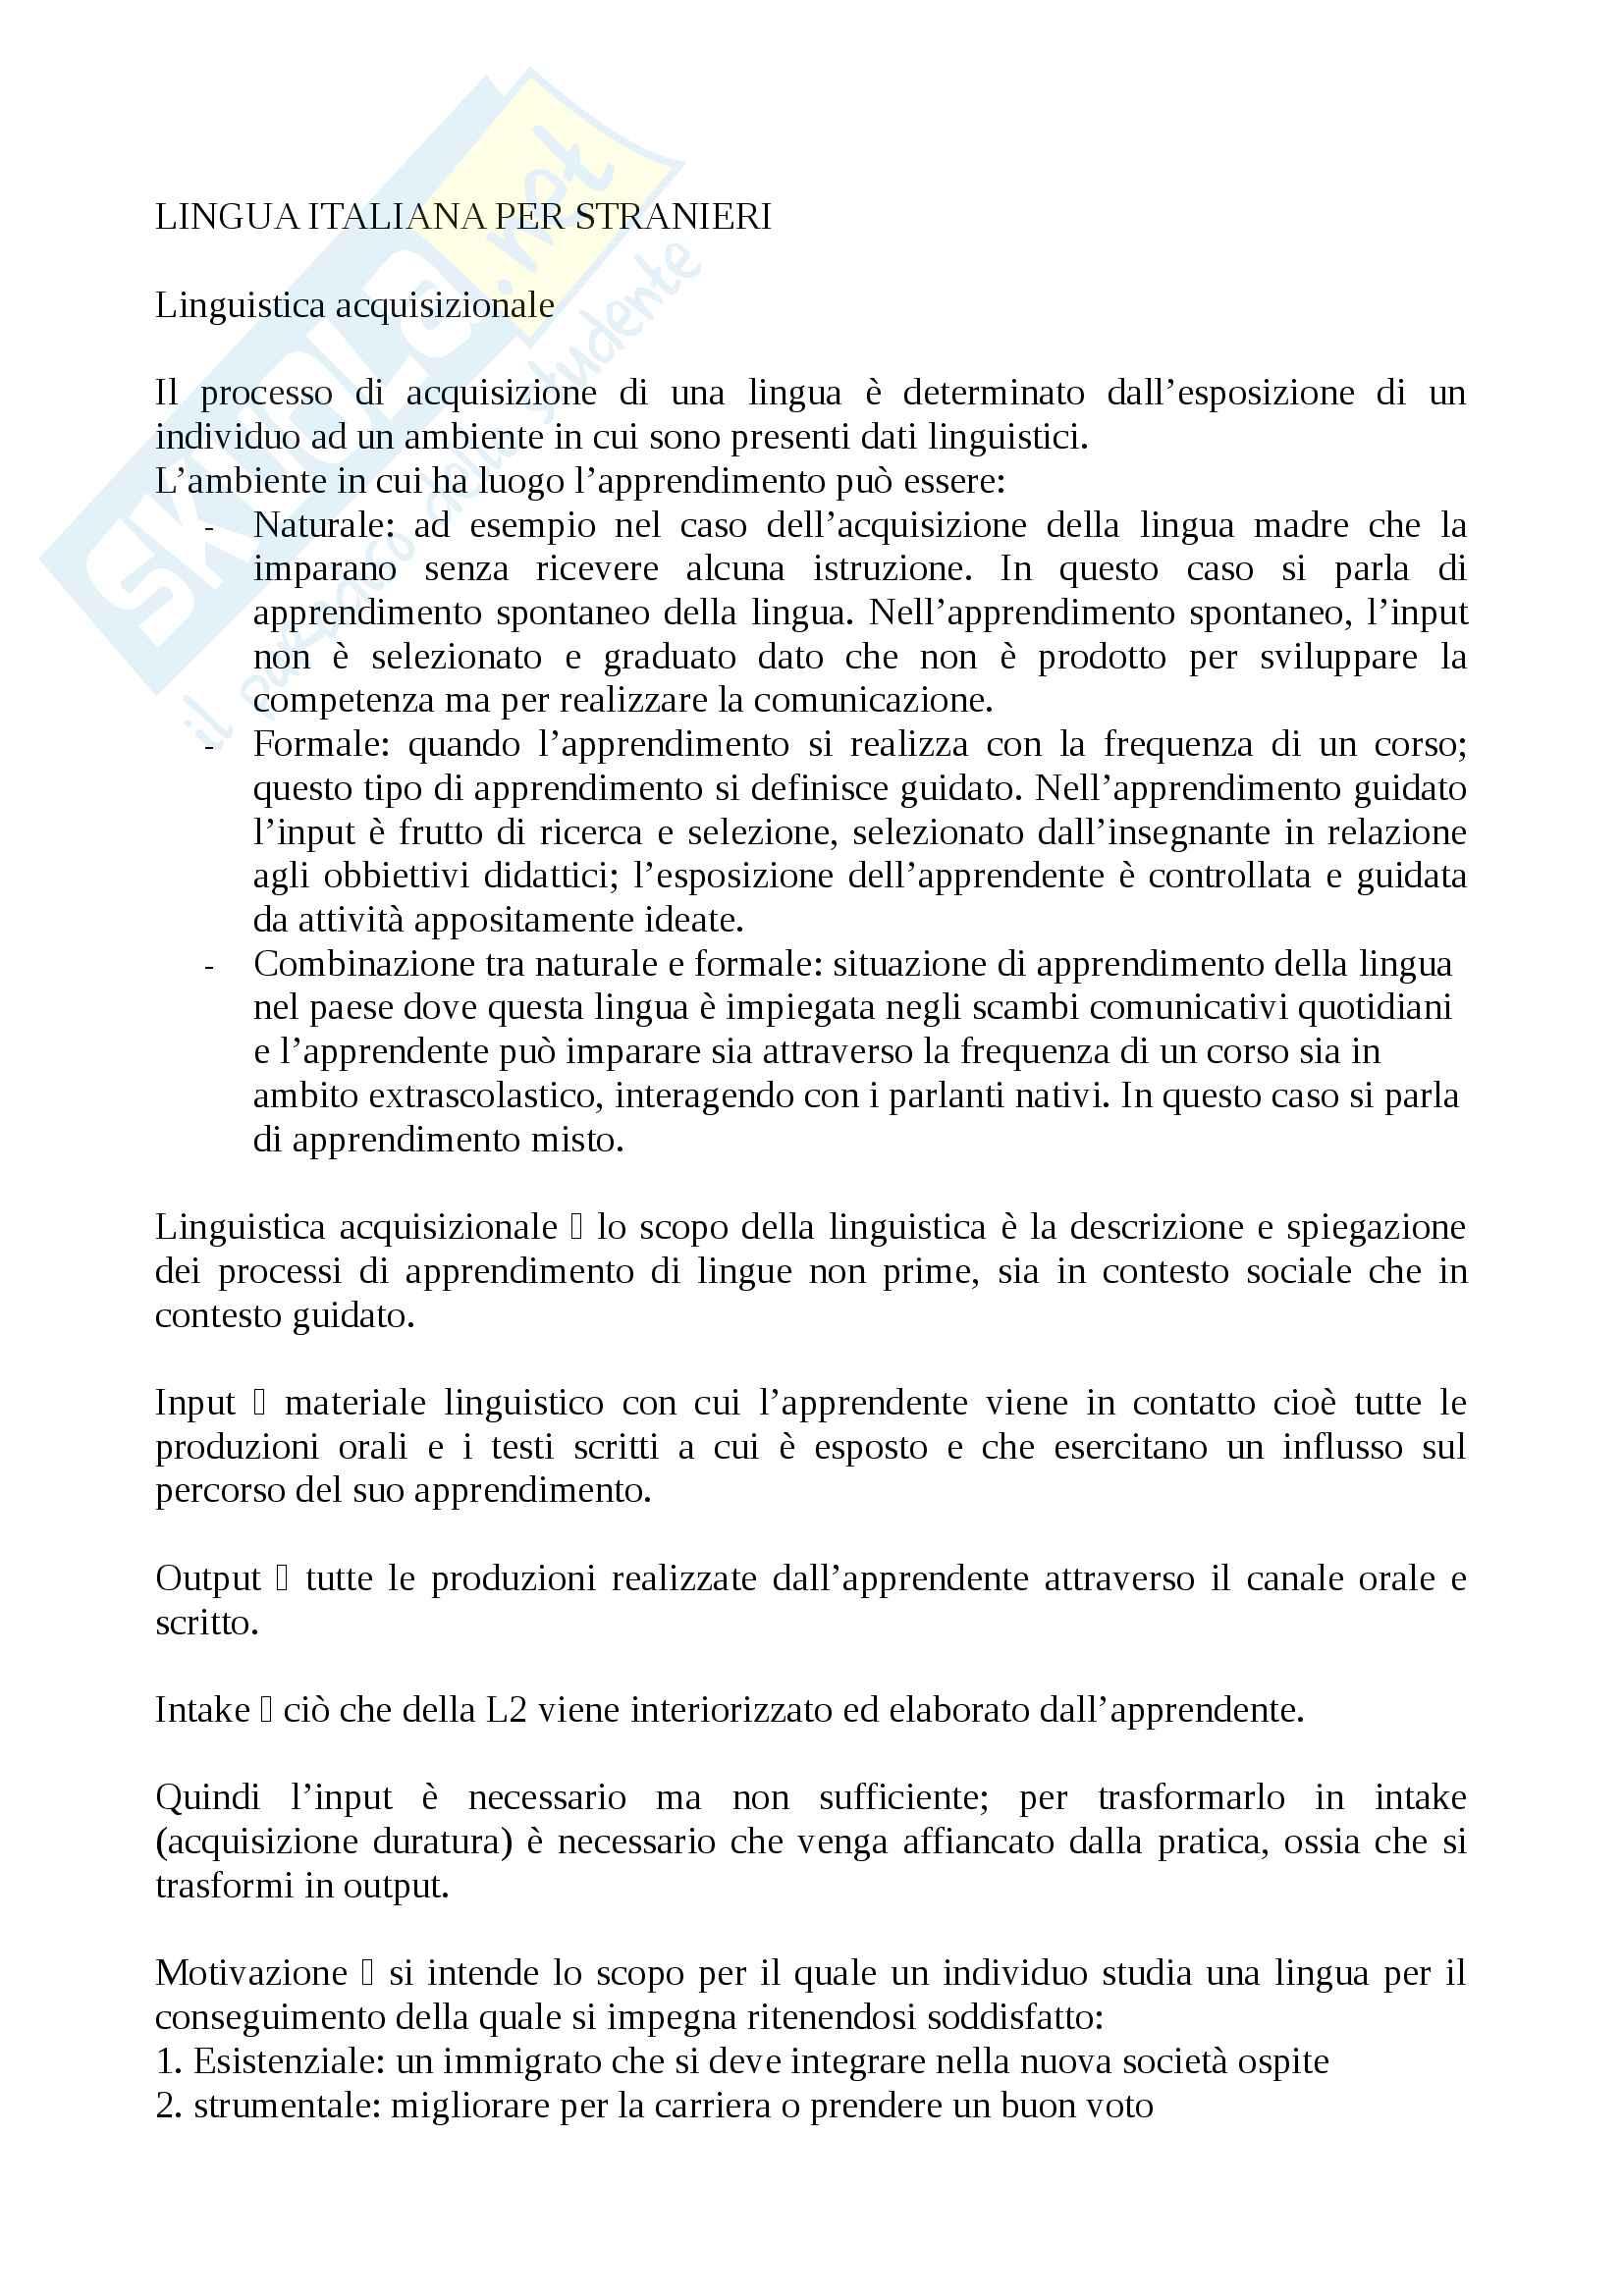 Riassunto esame Lingua Italiana per Stranieri